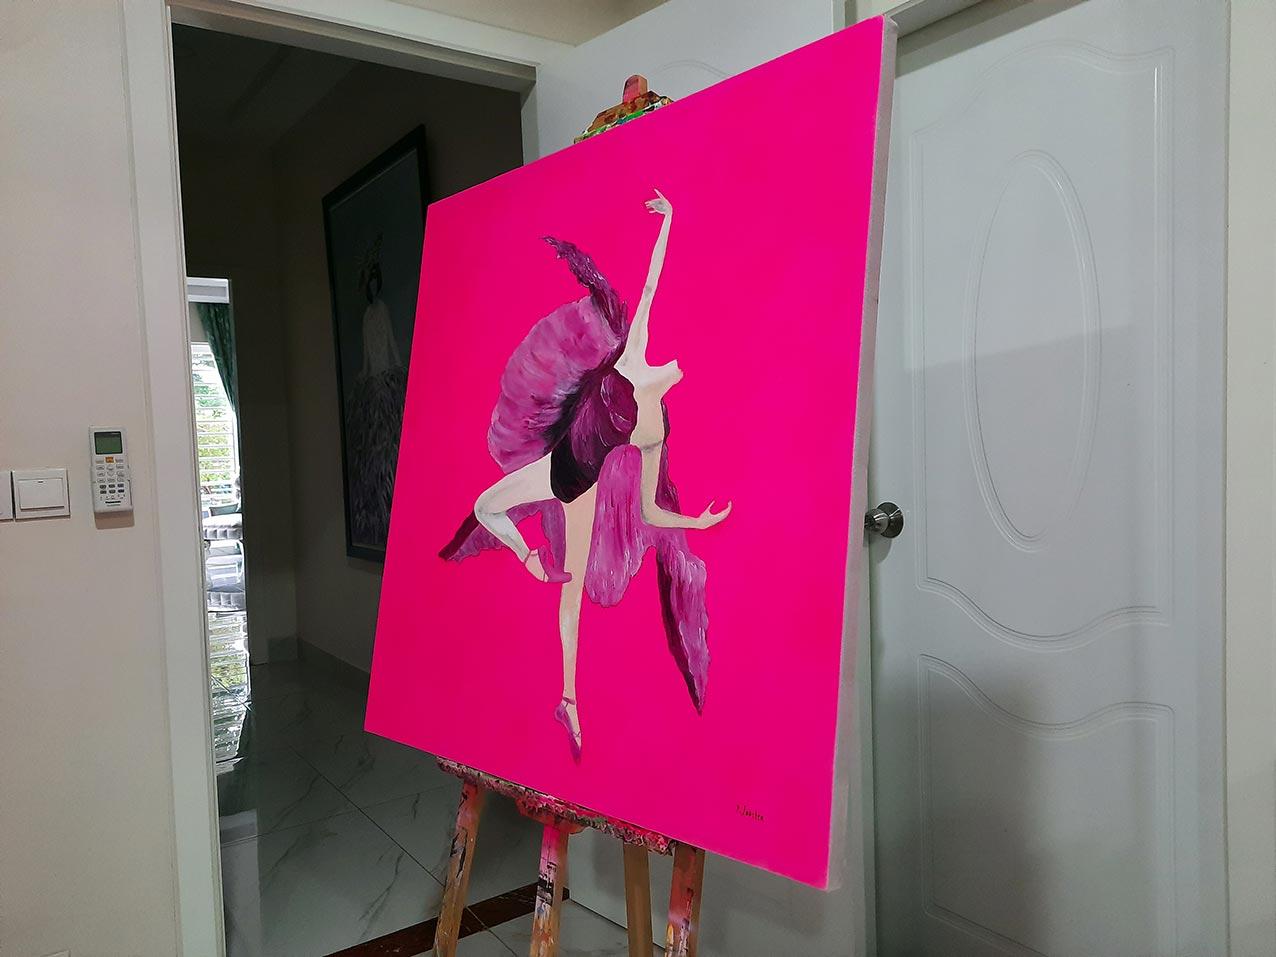 Body-Dancer-Patrick-Joosten-2020-December-08th-Side-view